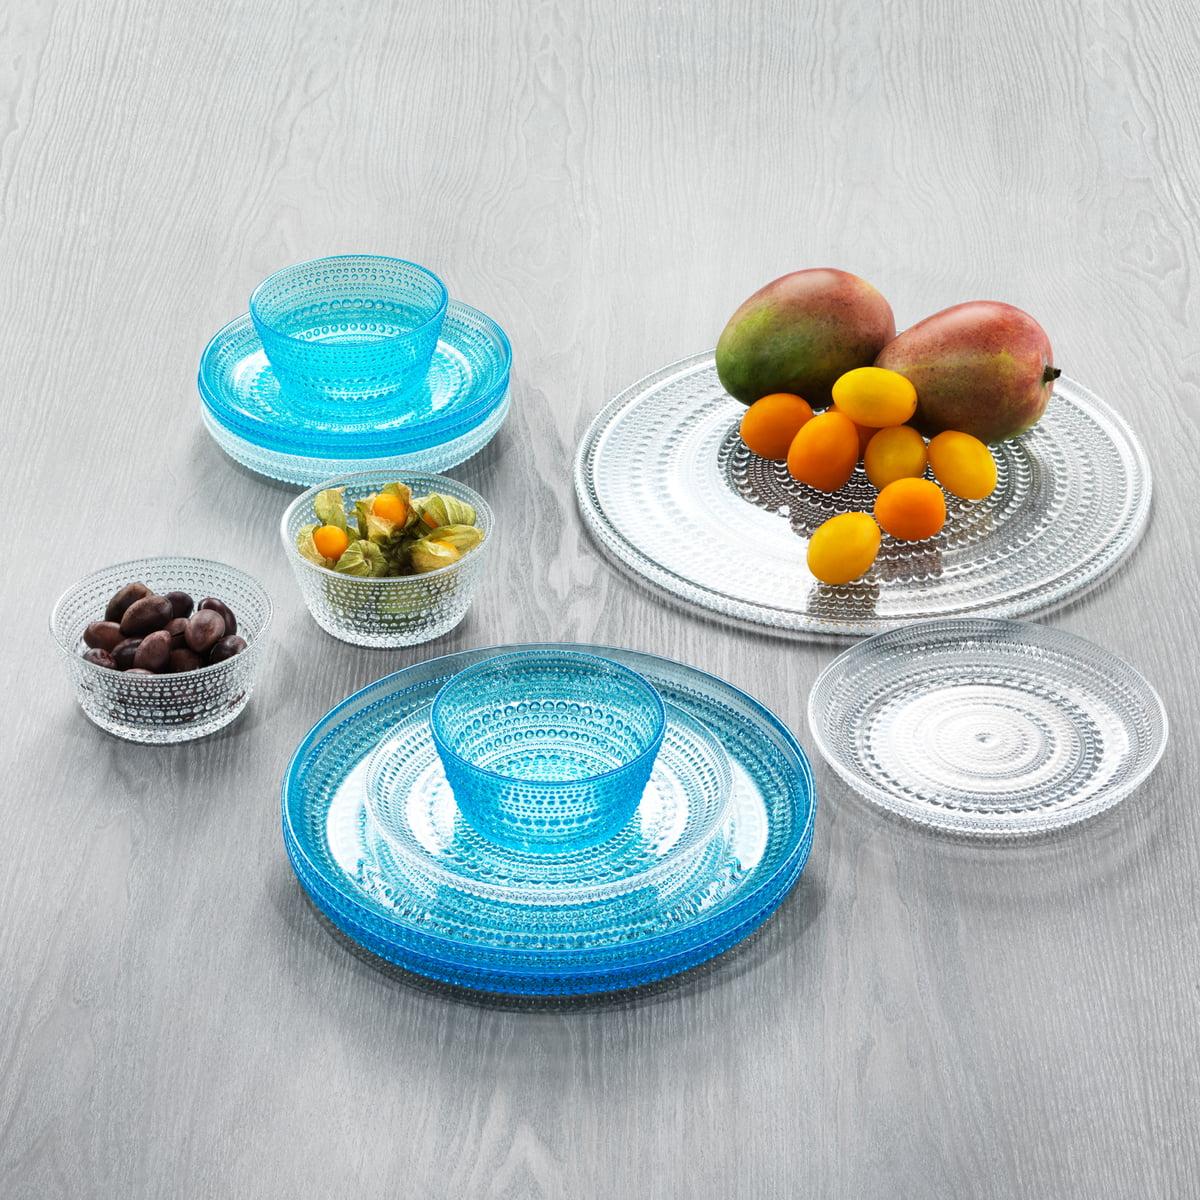 kastehelmi cake plate by iittala in the shop - iittala  kastehelmi collection